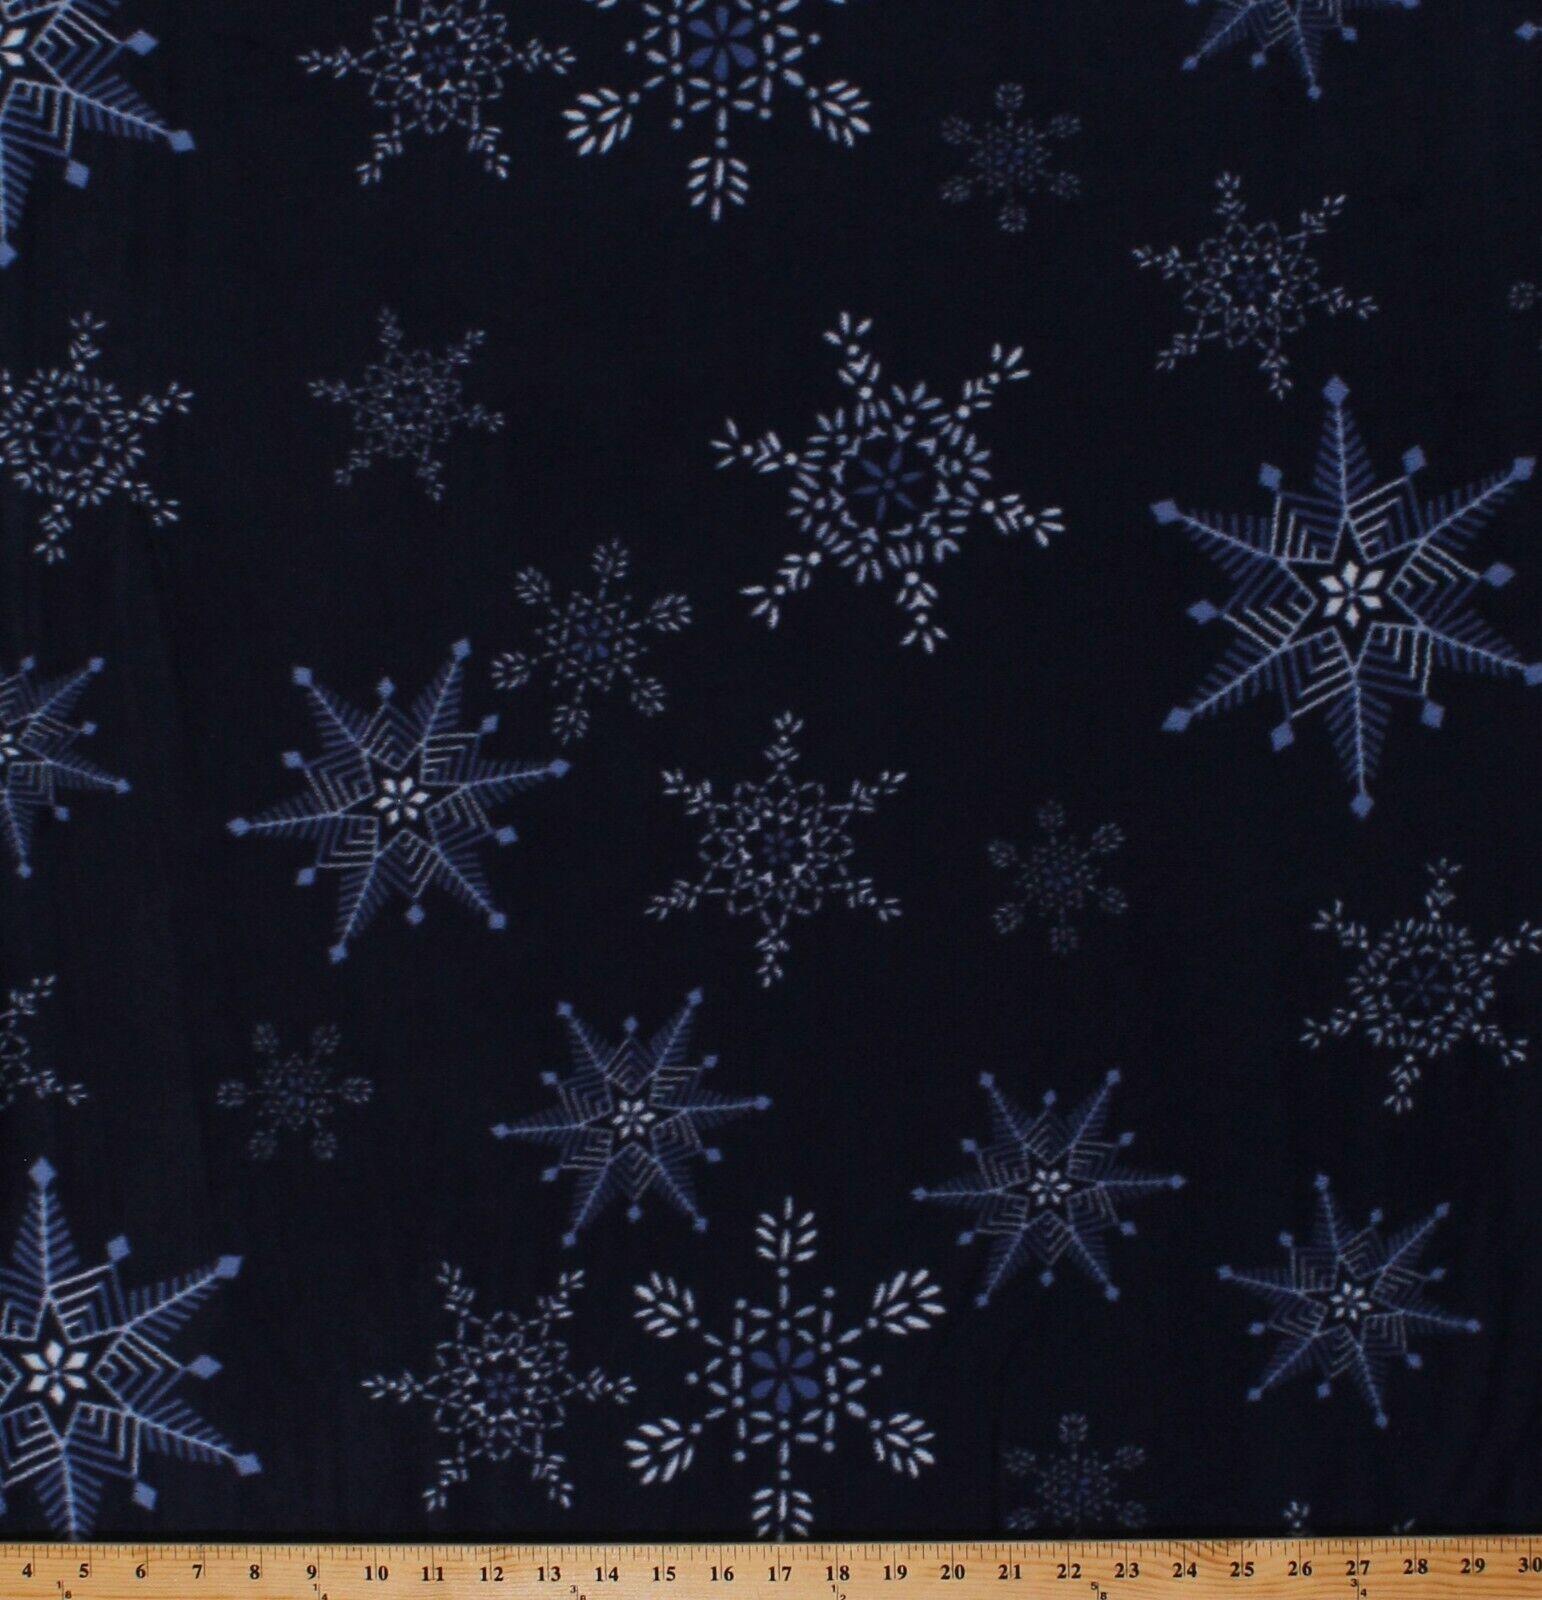 Fleece Snowflakes on Navy Blue Christmas Winter Fleece Fabri